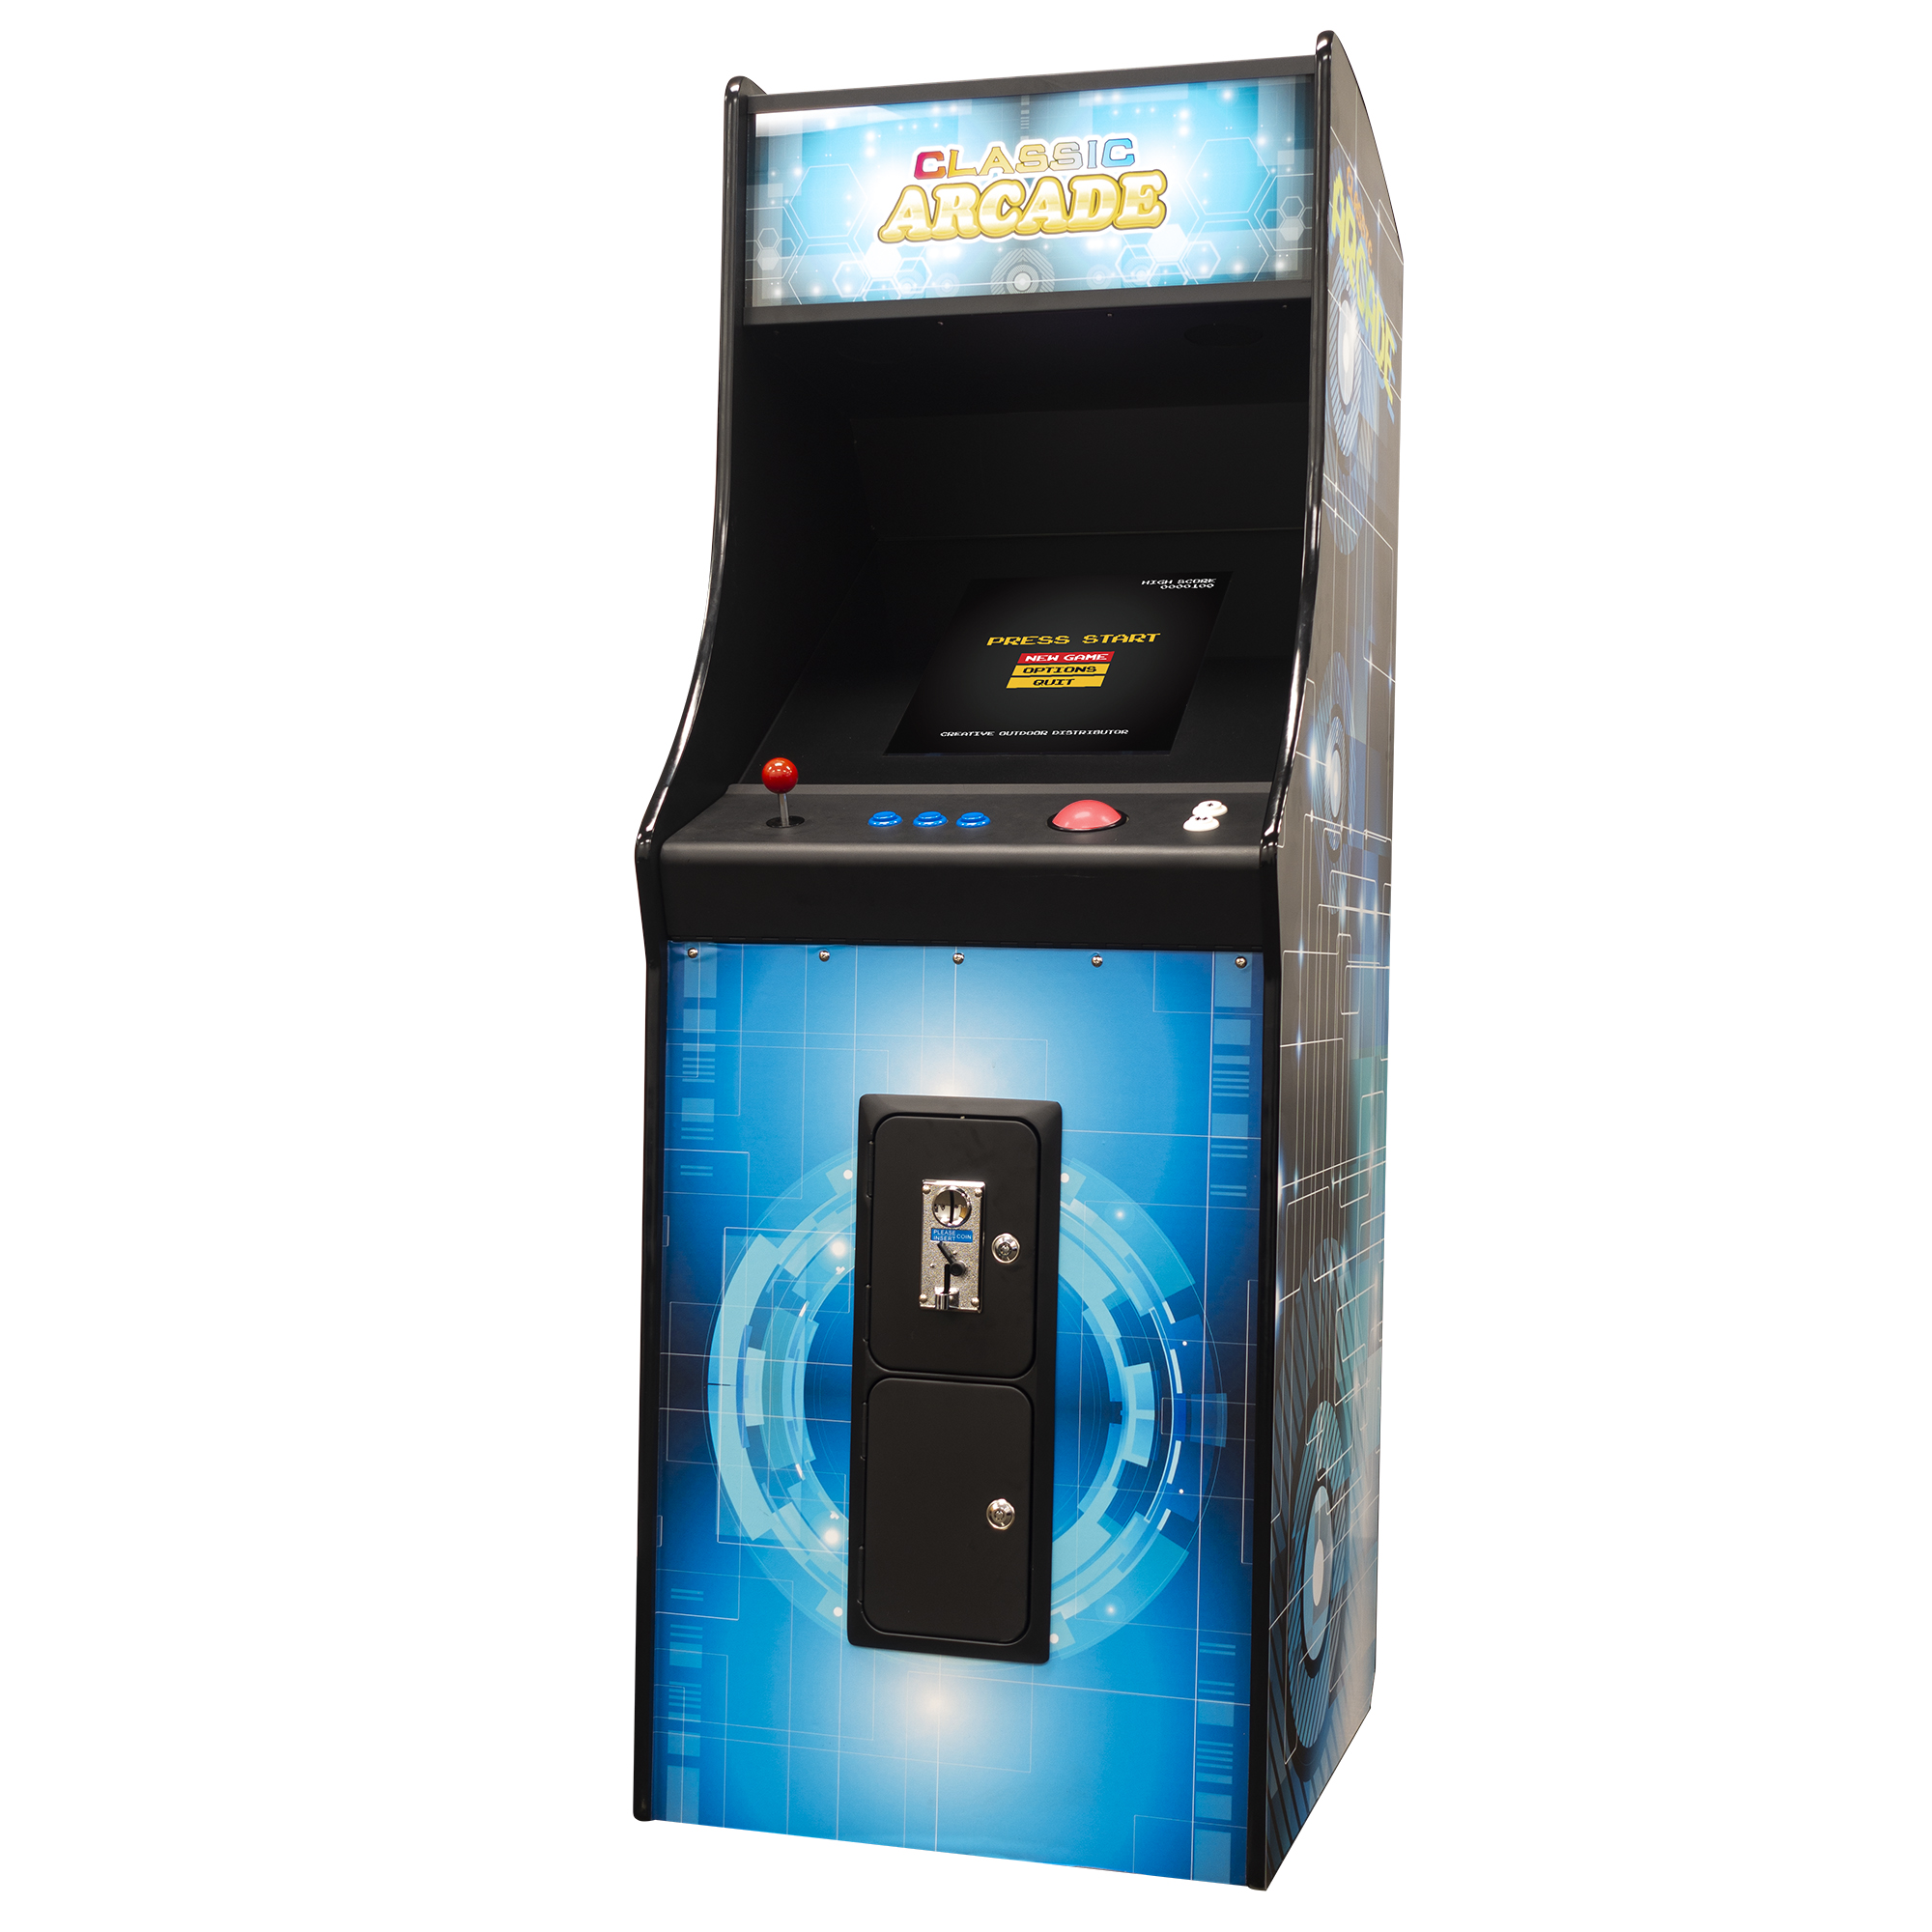 Creative Arcades Full-Size Commercial Grade Cabinet Arcade Machine | Trackball | 60 Classic Games | 2 Sanwa Joysticks | 2 Stools | 3-Year Warranty